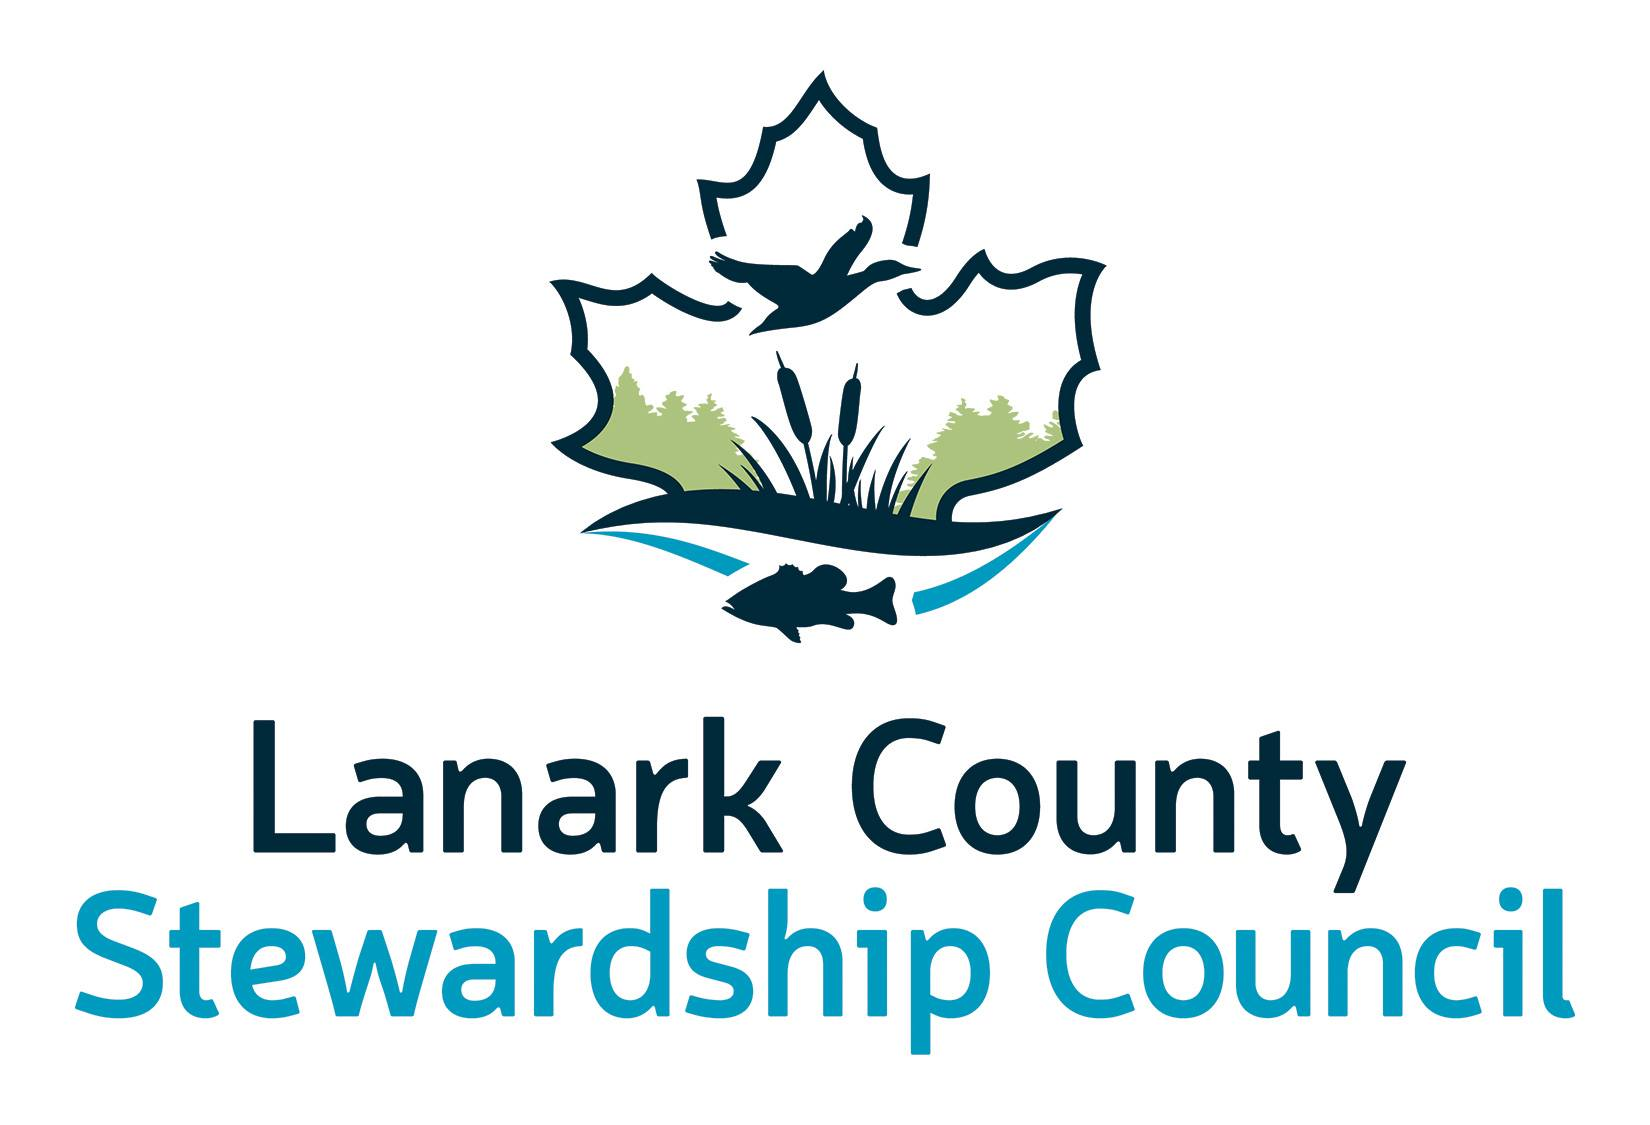 Lanark Stewardship Council